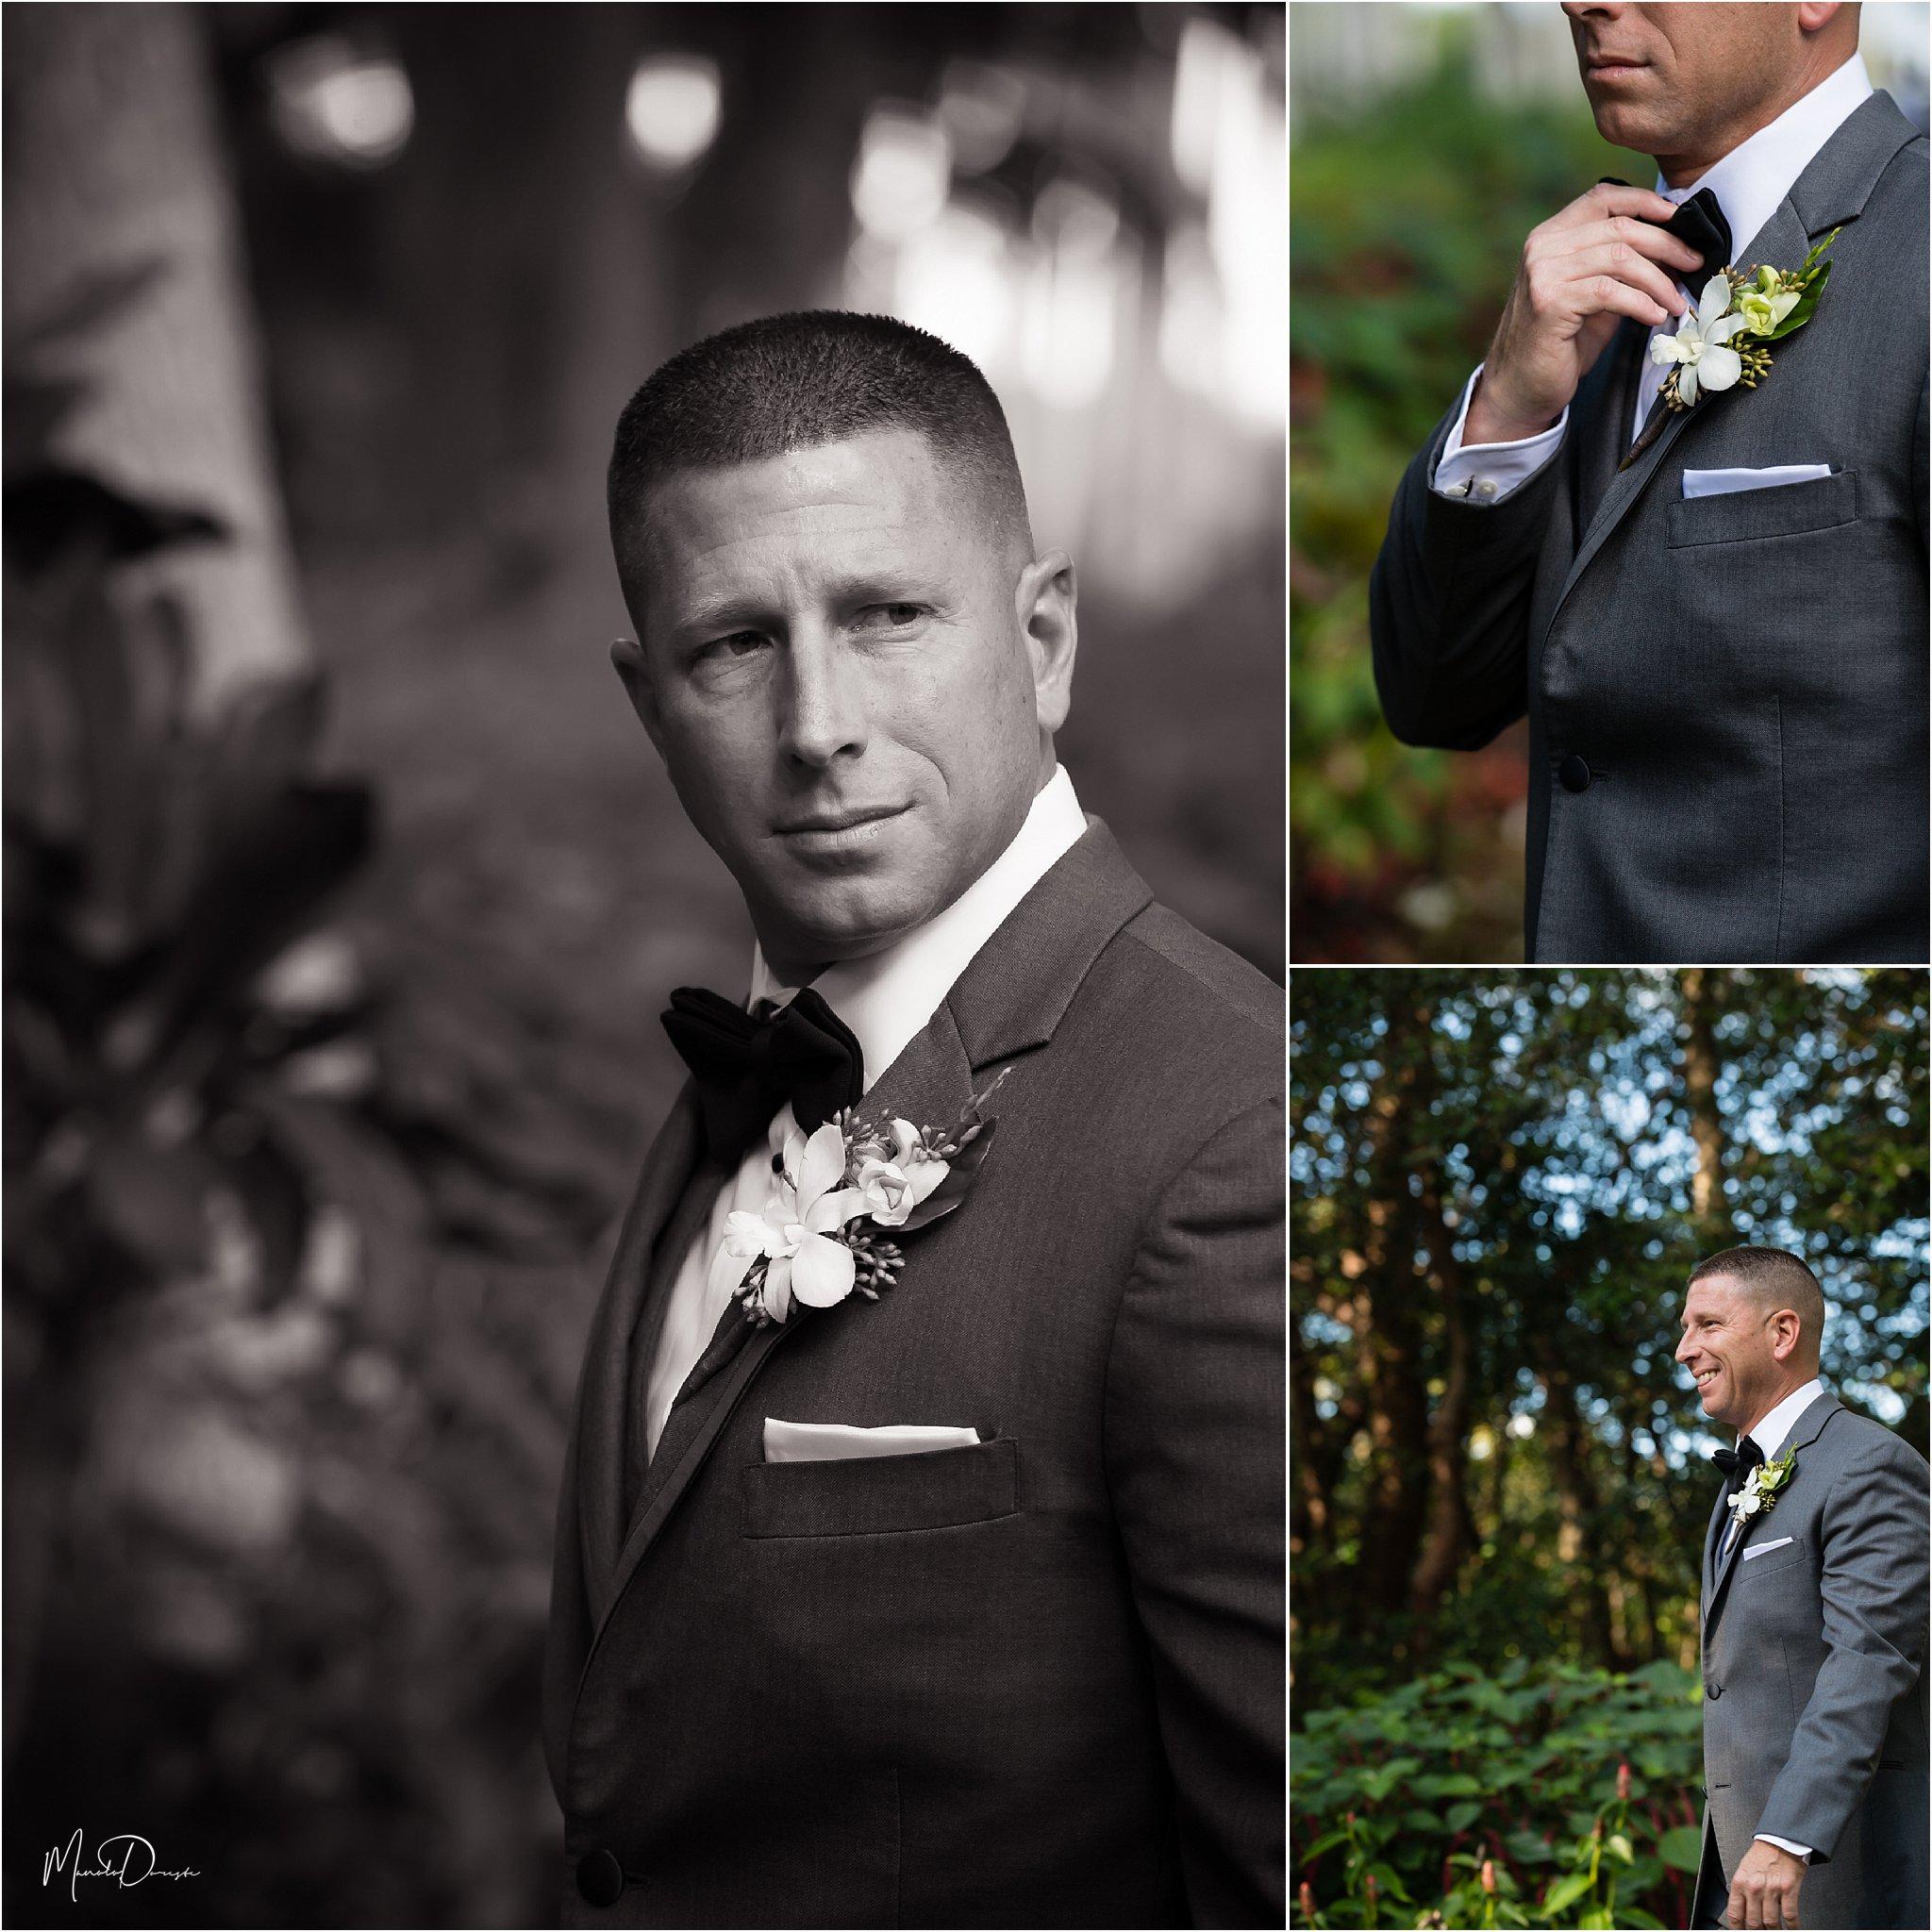 00837_ManoloDoreste_InFocusStudios_Wedding_Family_Photography_Miami_MiamiPhotographer.jpg